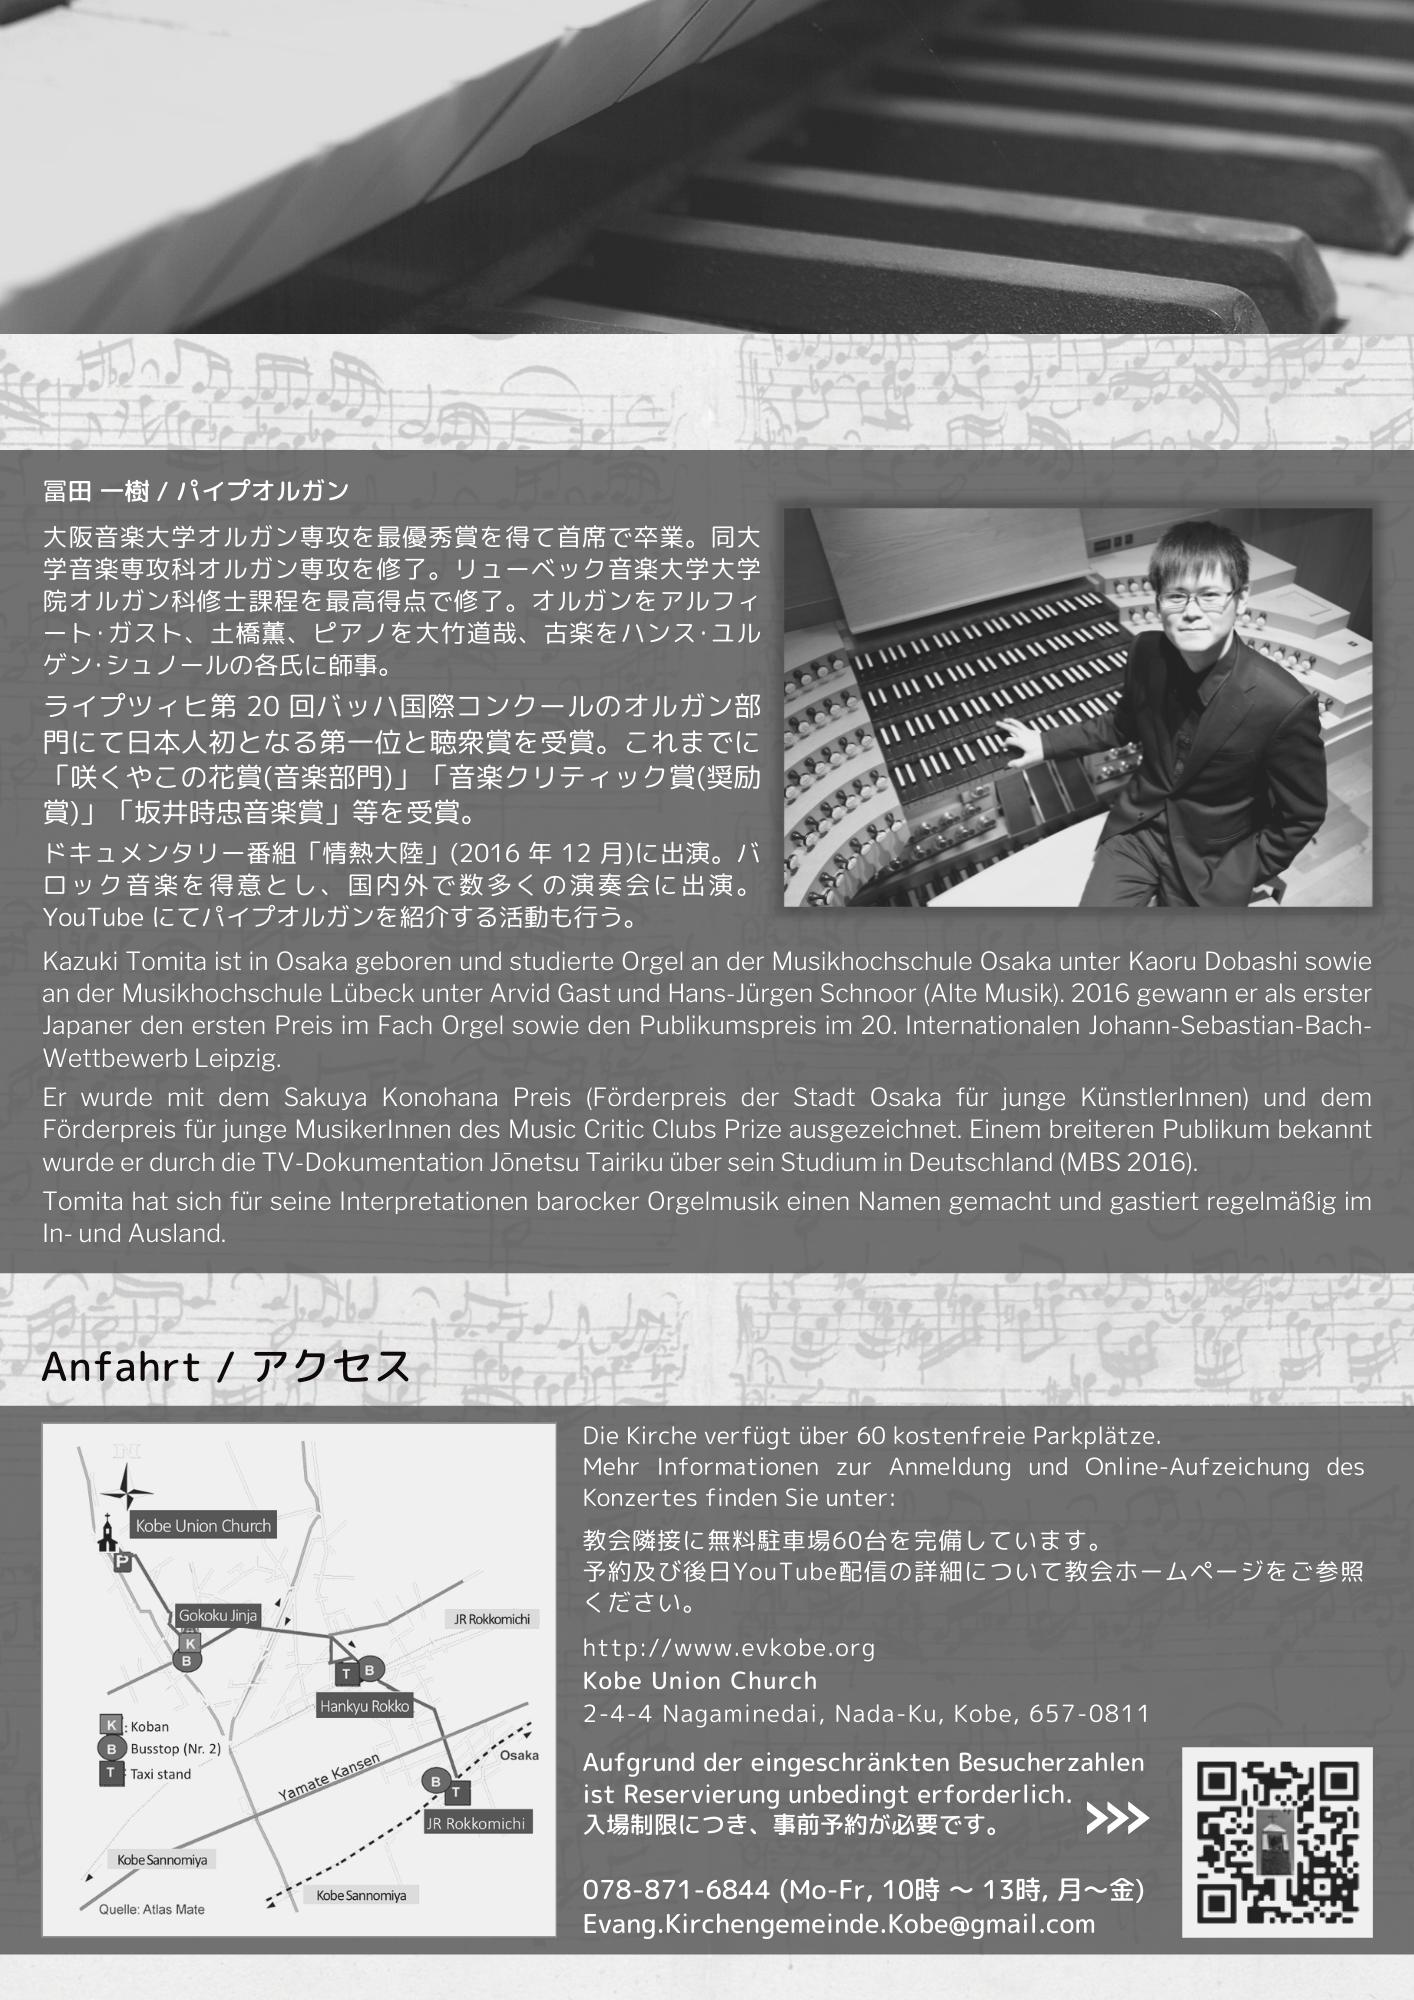 https://organ-recital-kazuki-tomita.peatix.com/